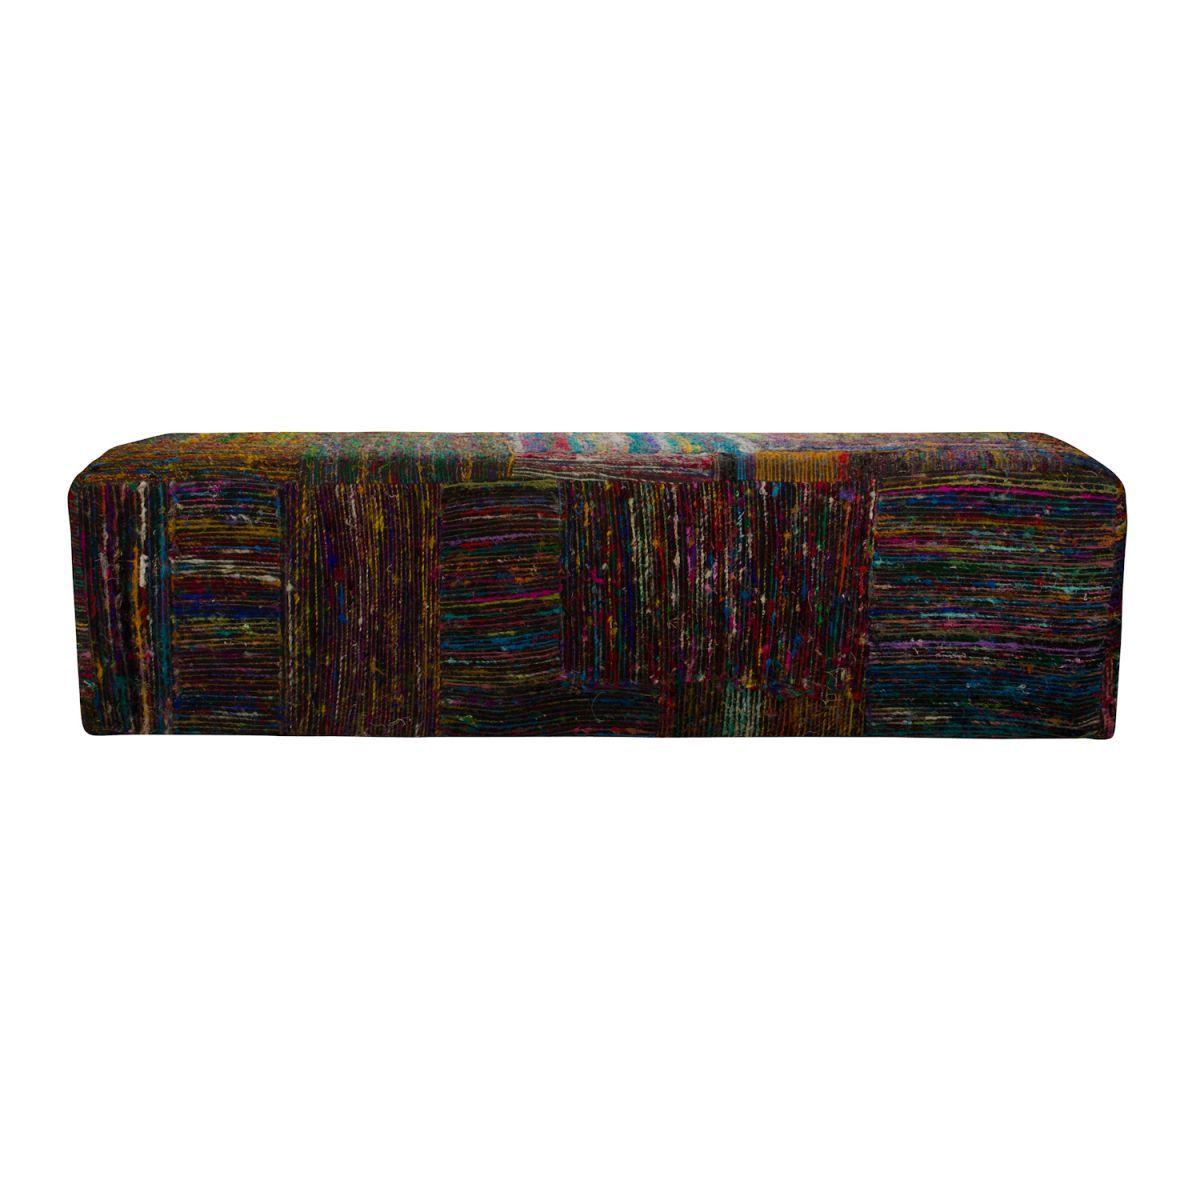 bank sofa rechthoekig silklane zwart multi 160x45x45cm